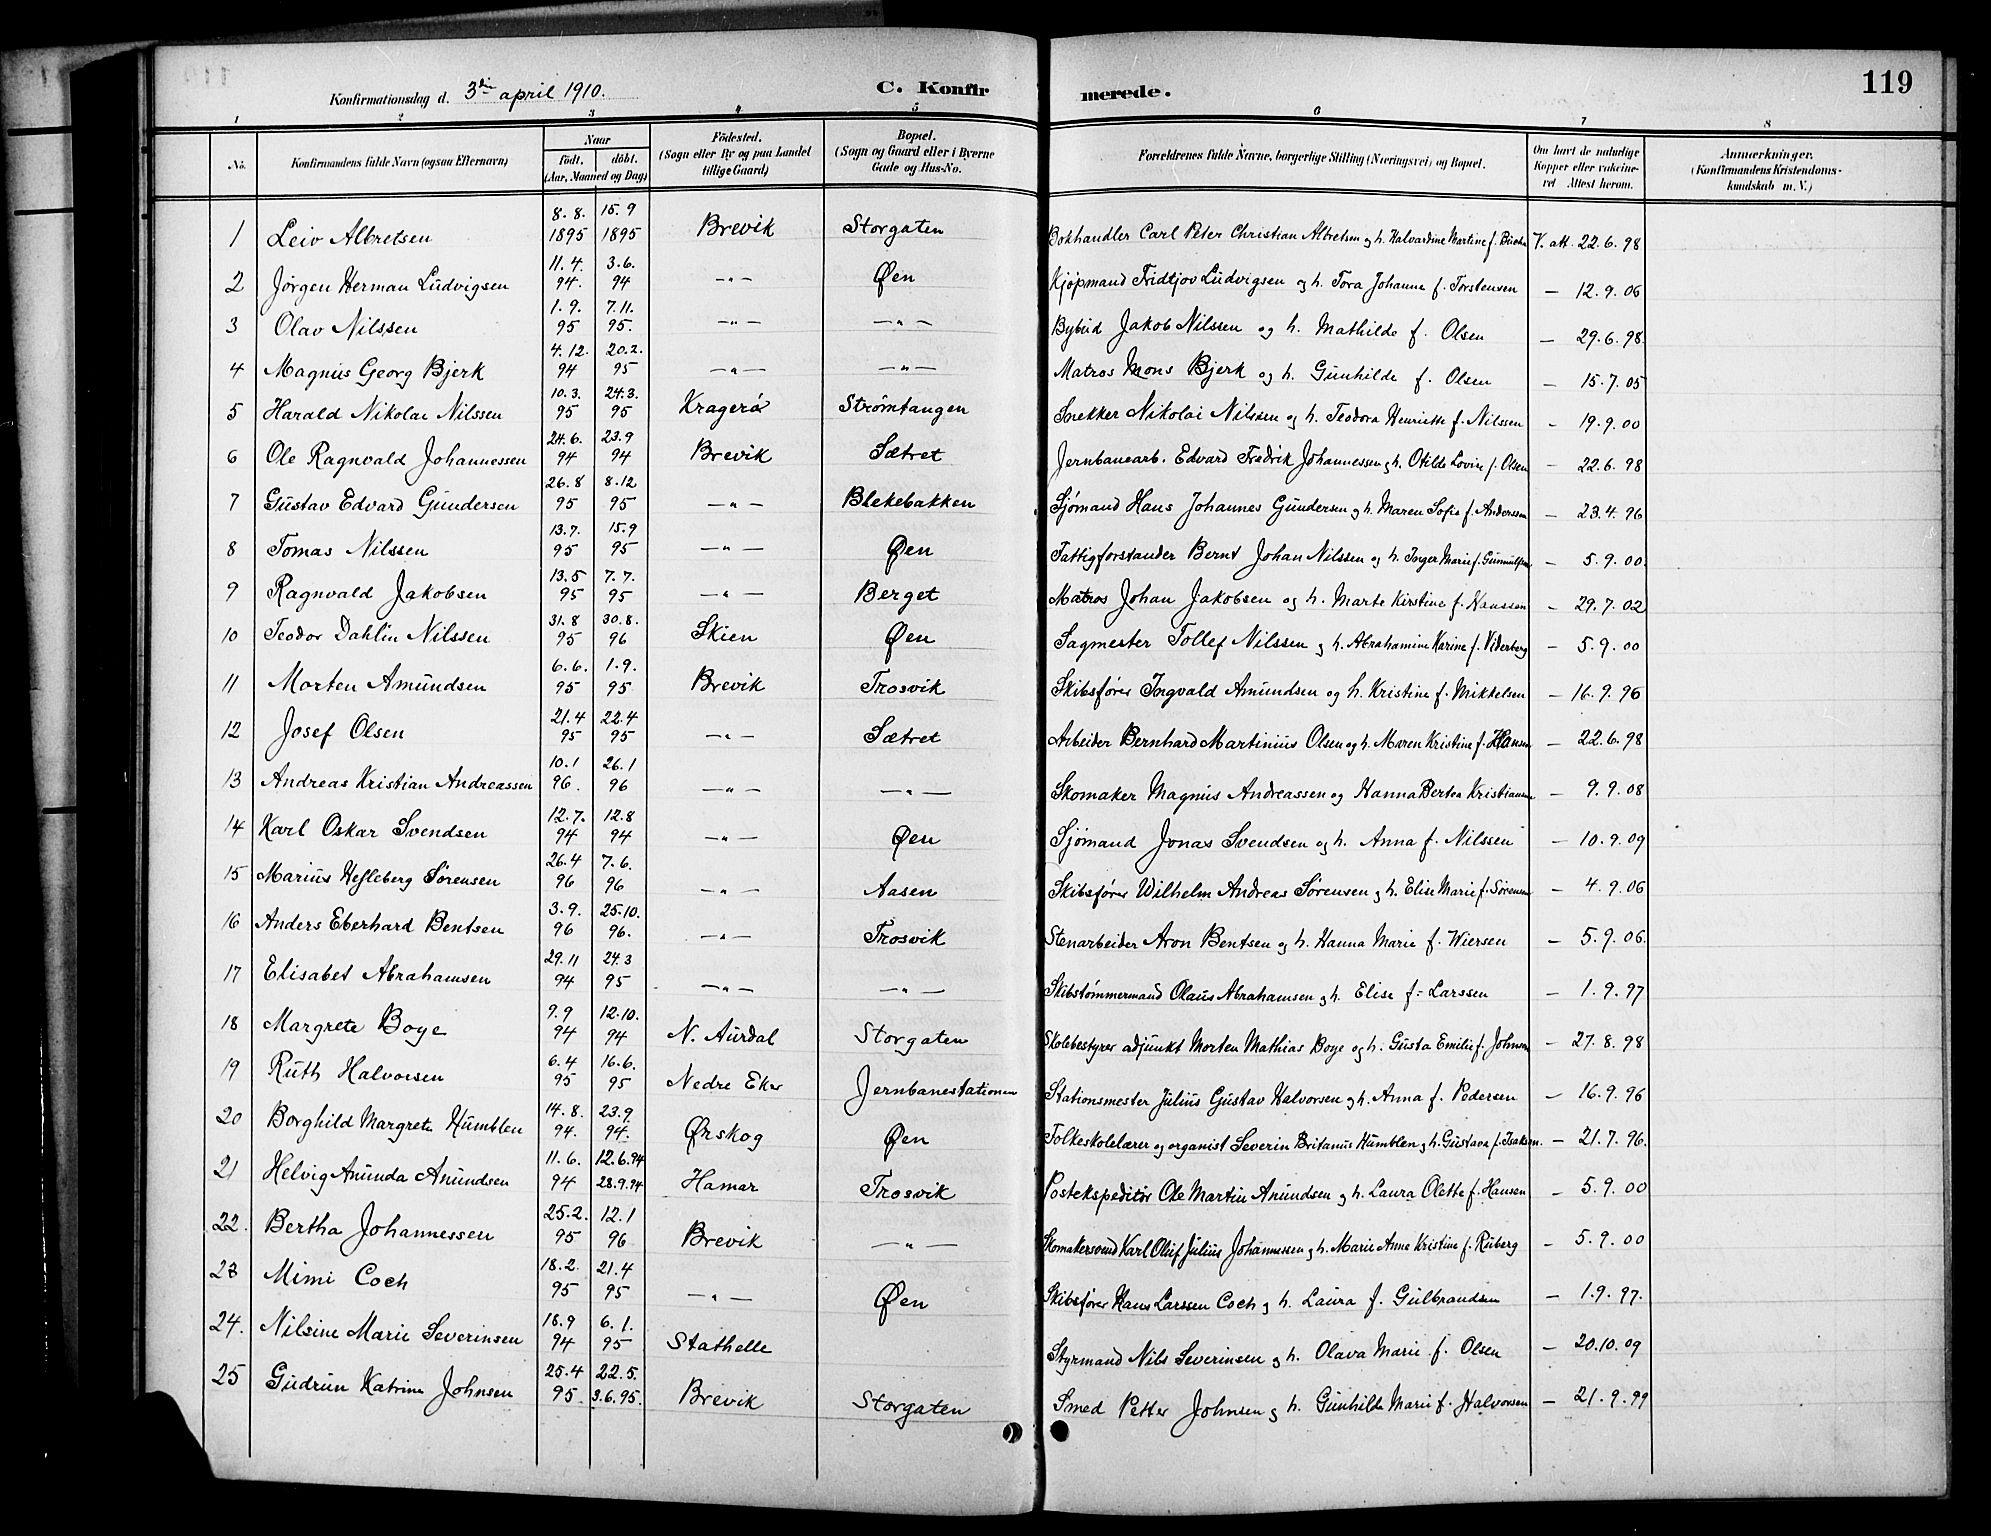 SAKO, Brevik kirkebøker, G/Ga/L0005: Klokkerbok nr. 5, 1901-1924, s. 119